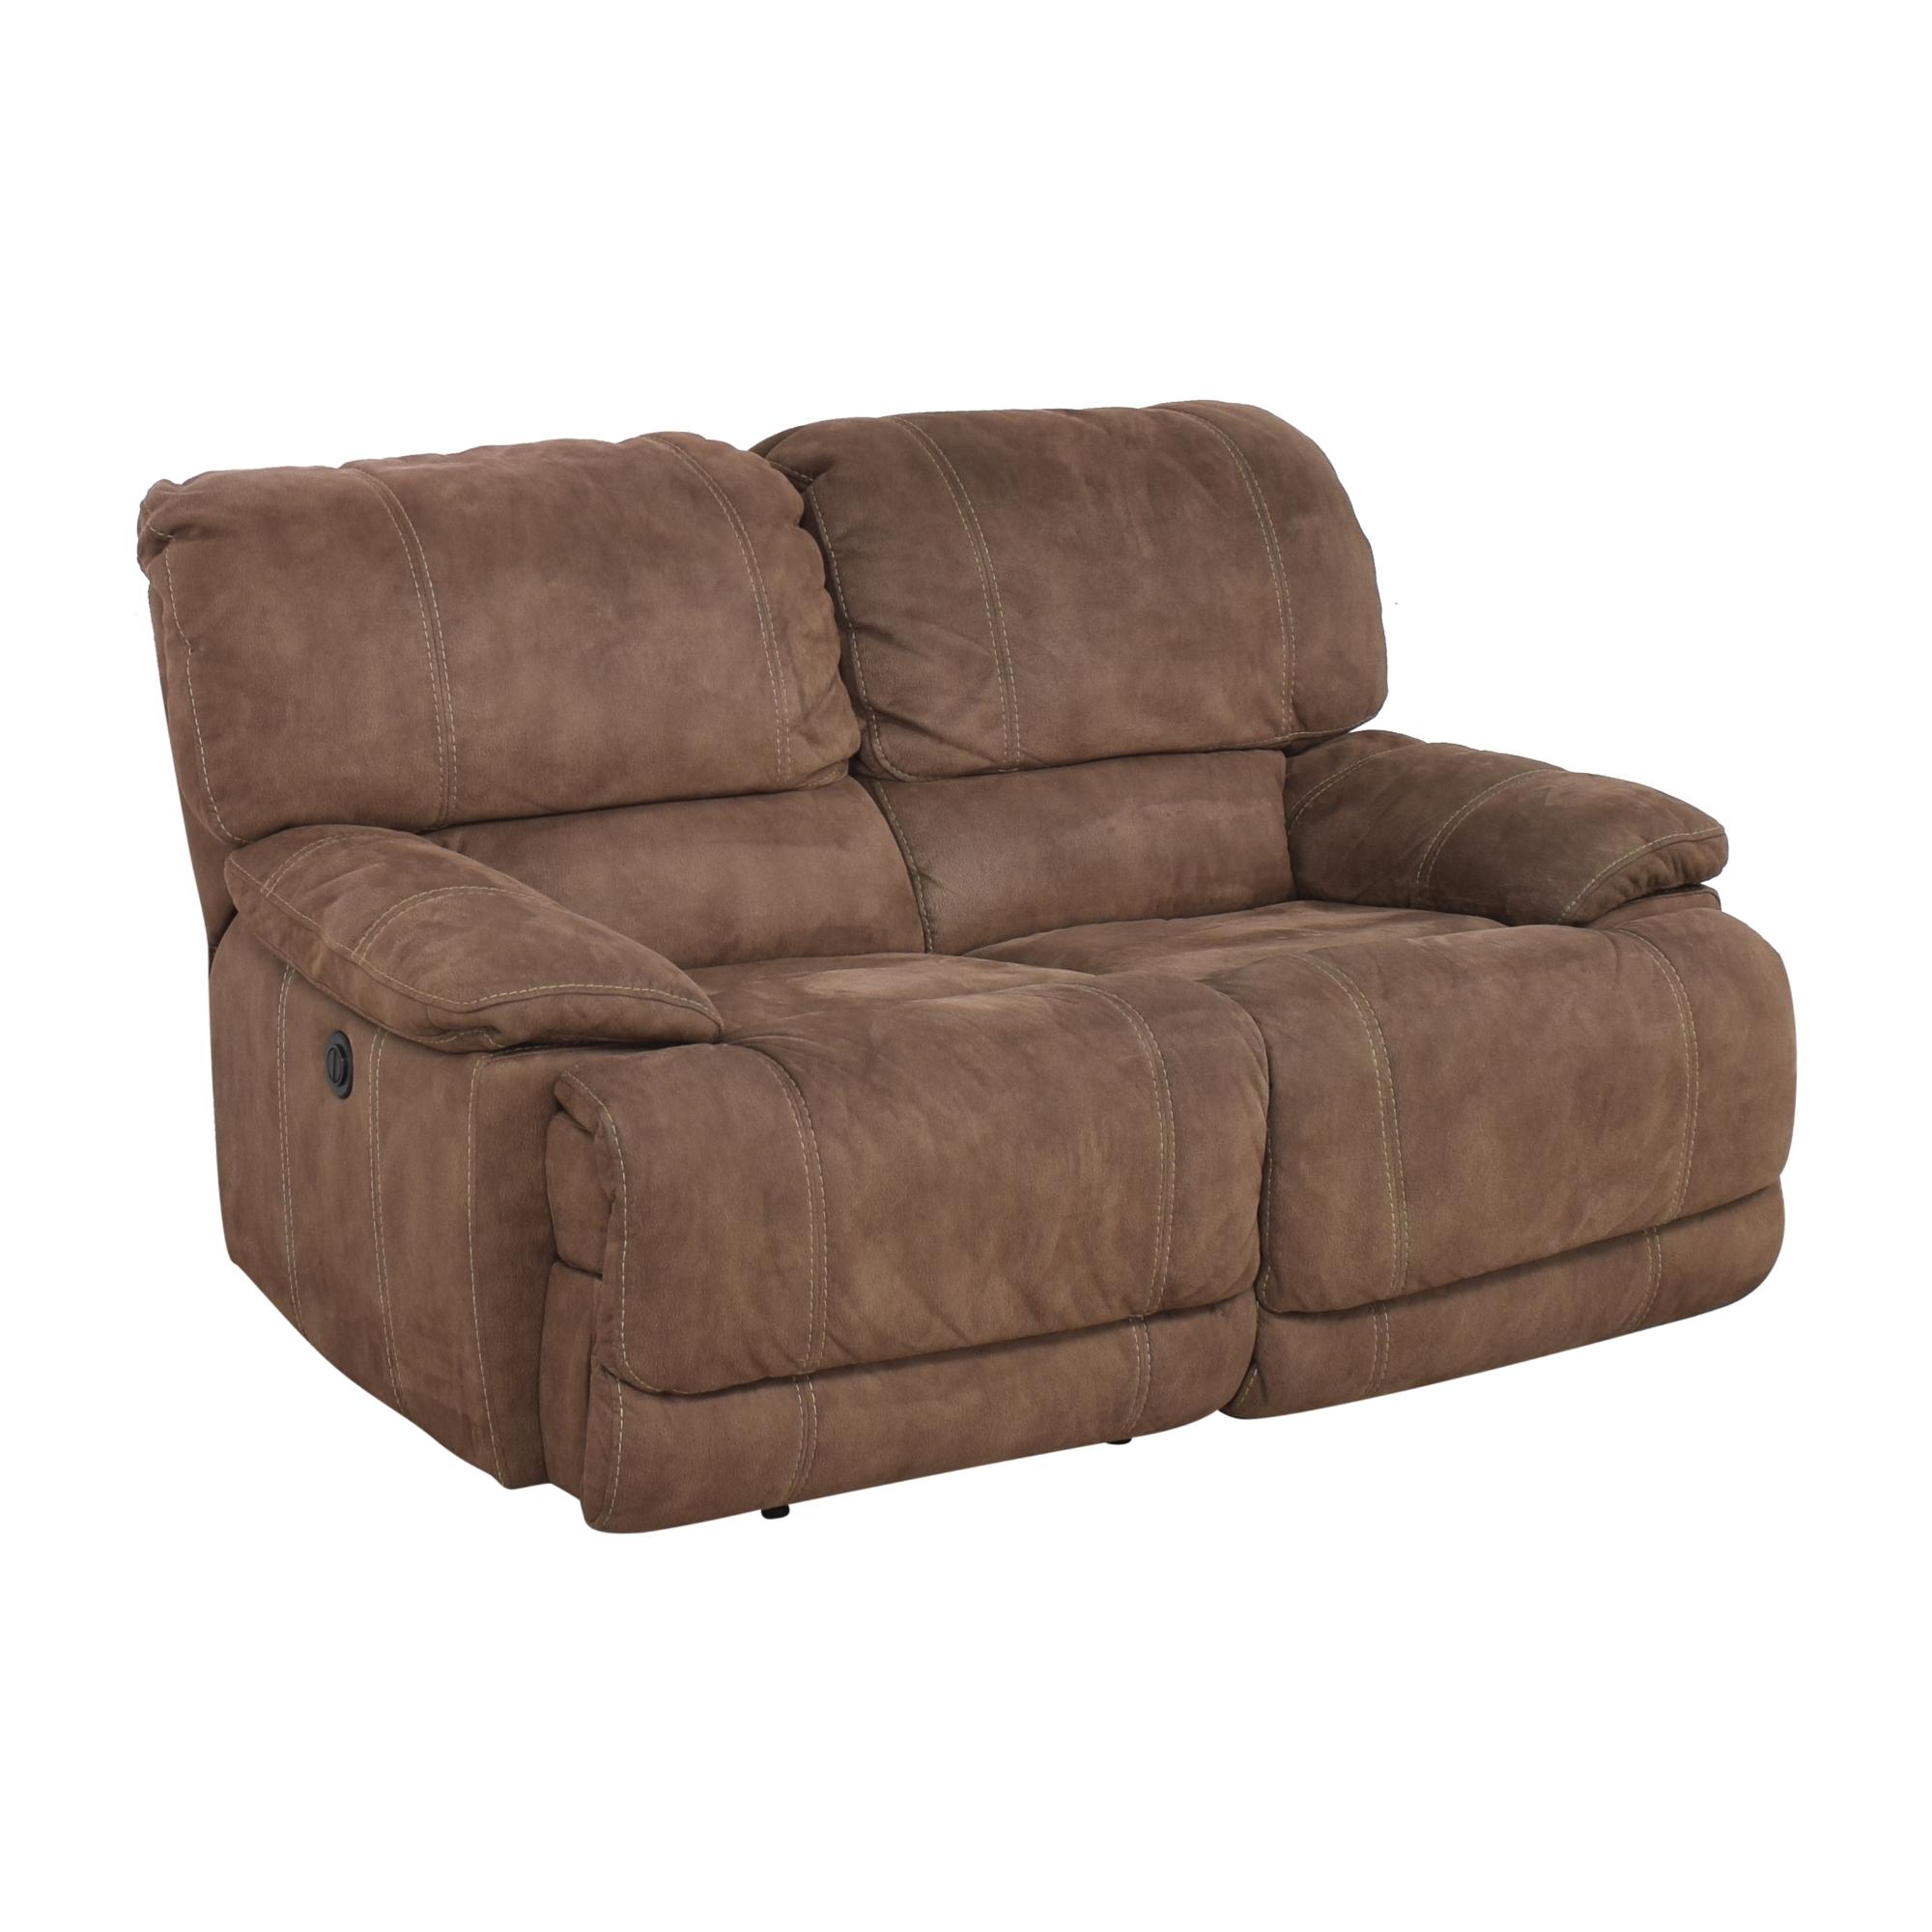 Macy's Macy's Power Reclining Felyx Sofa Sofas